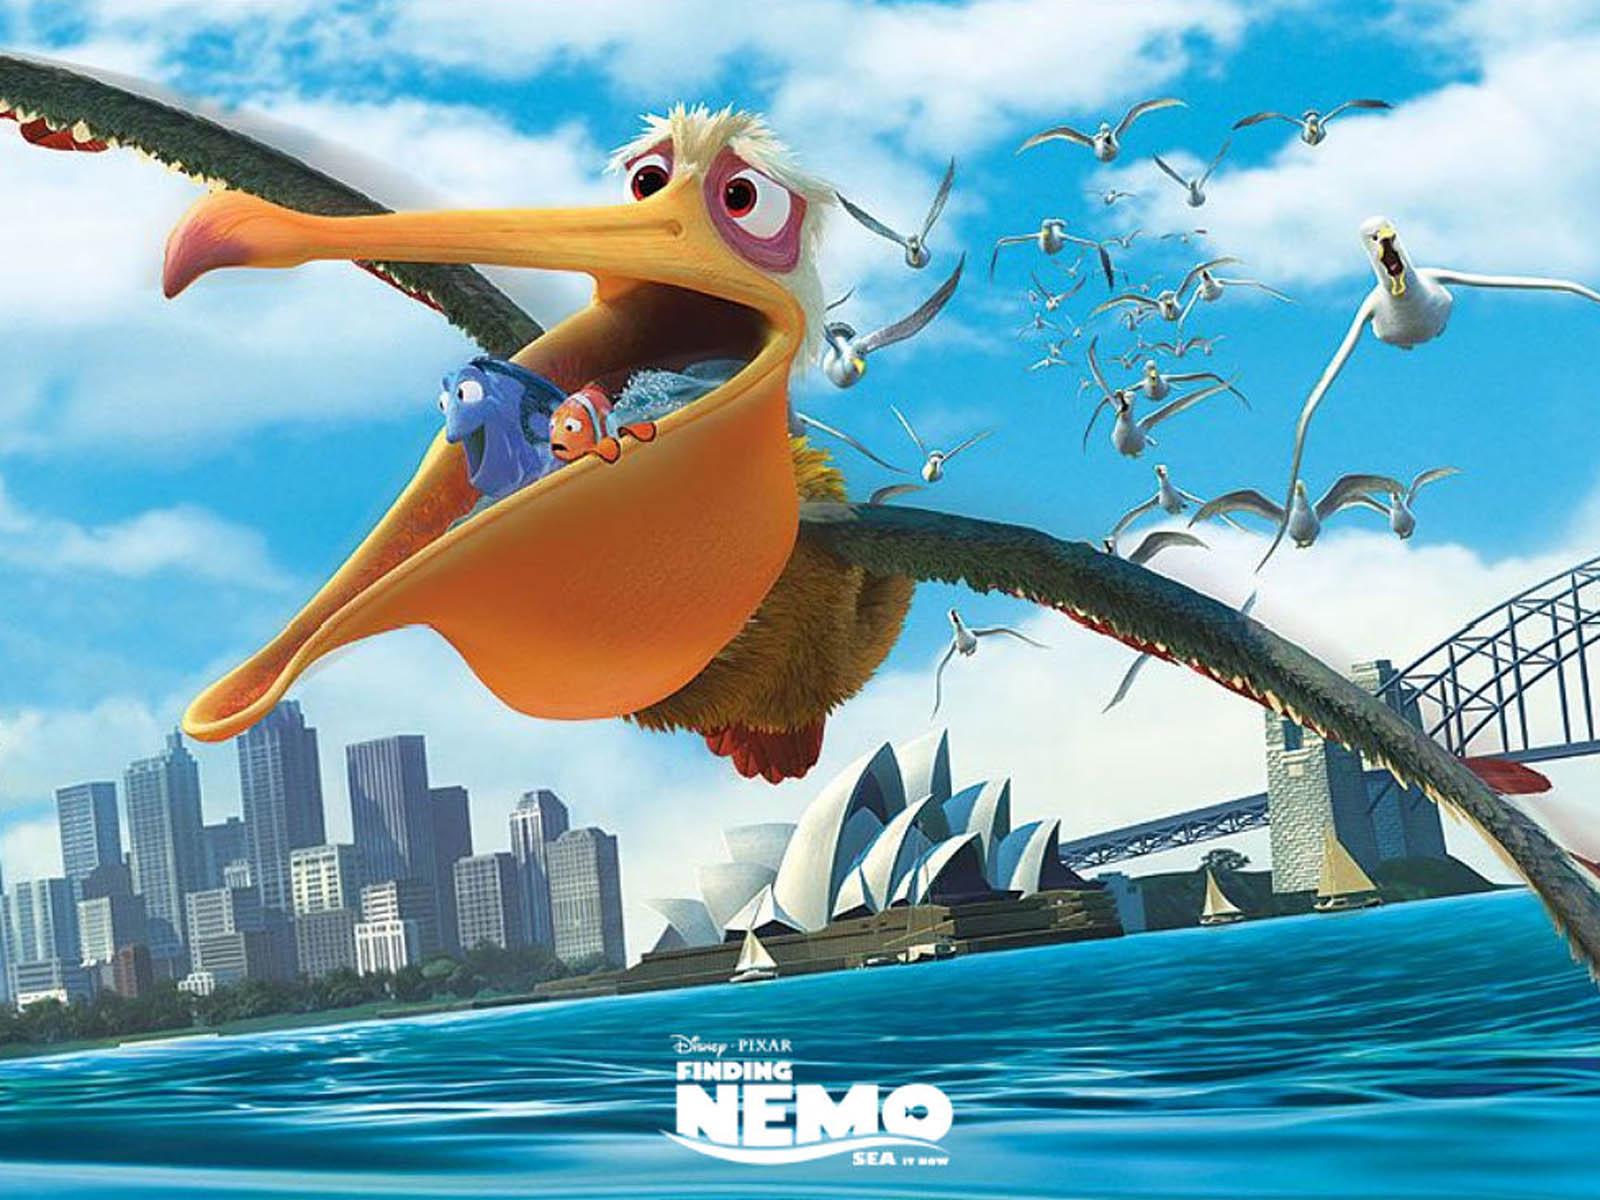 wallpapers: Finding Nemo Wallpapers